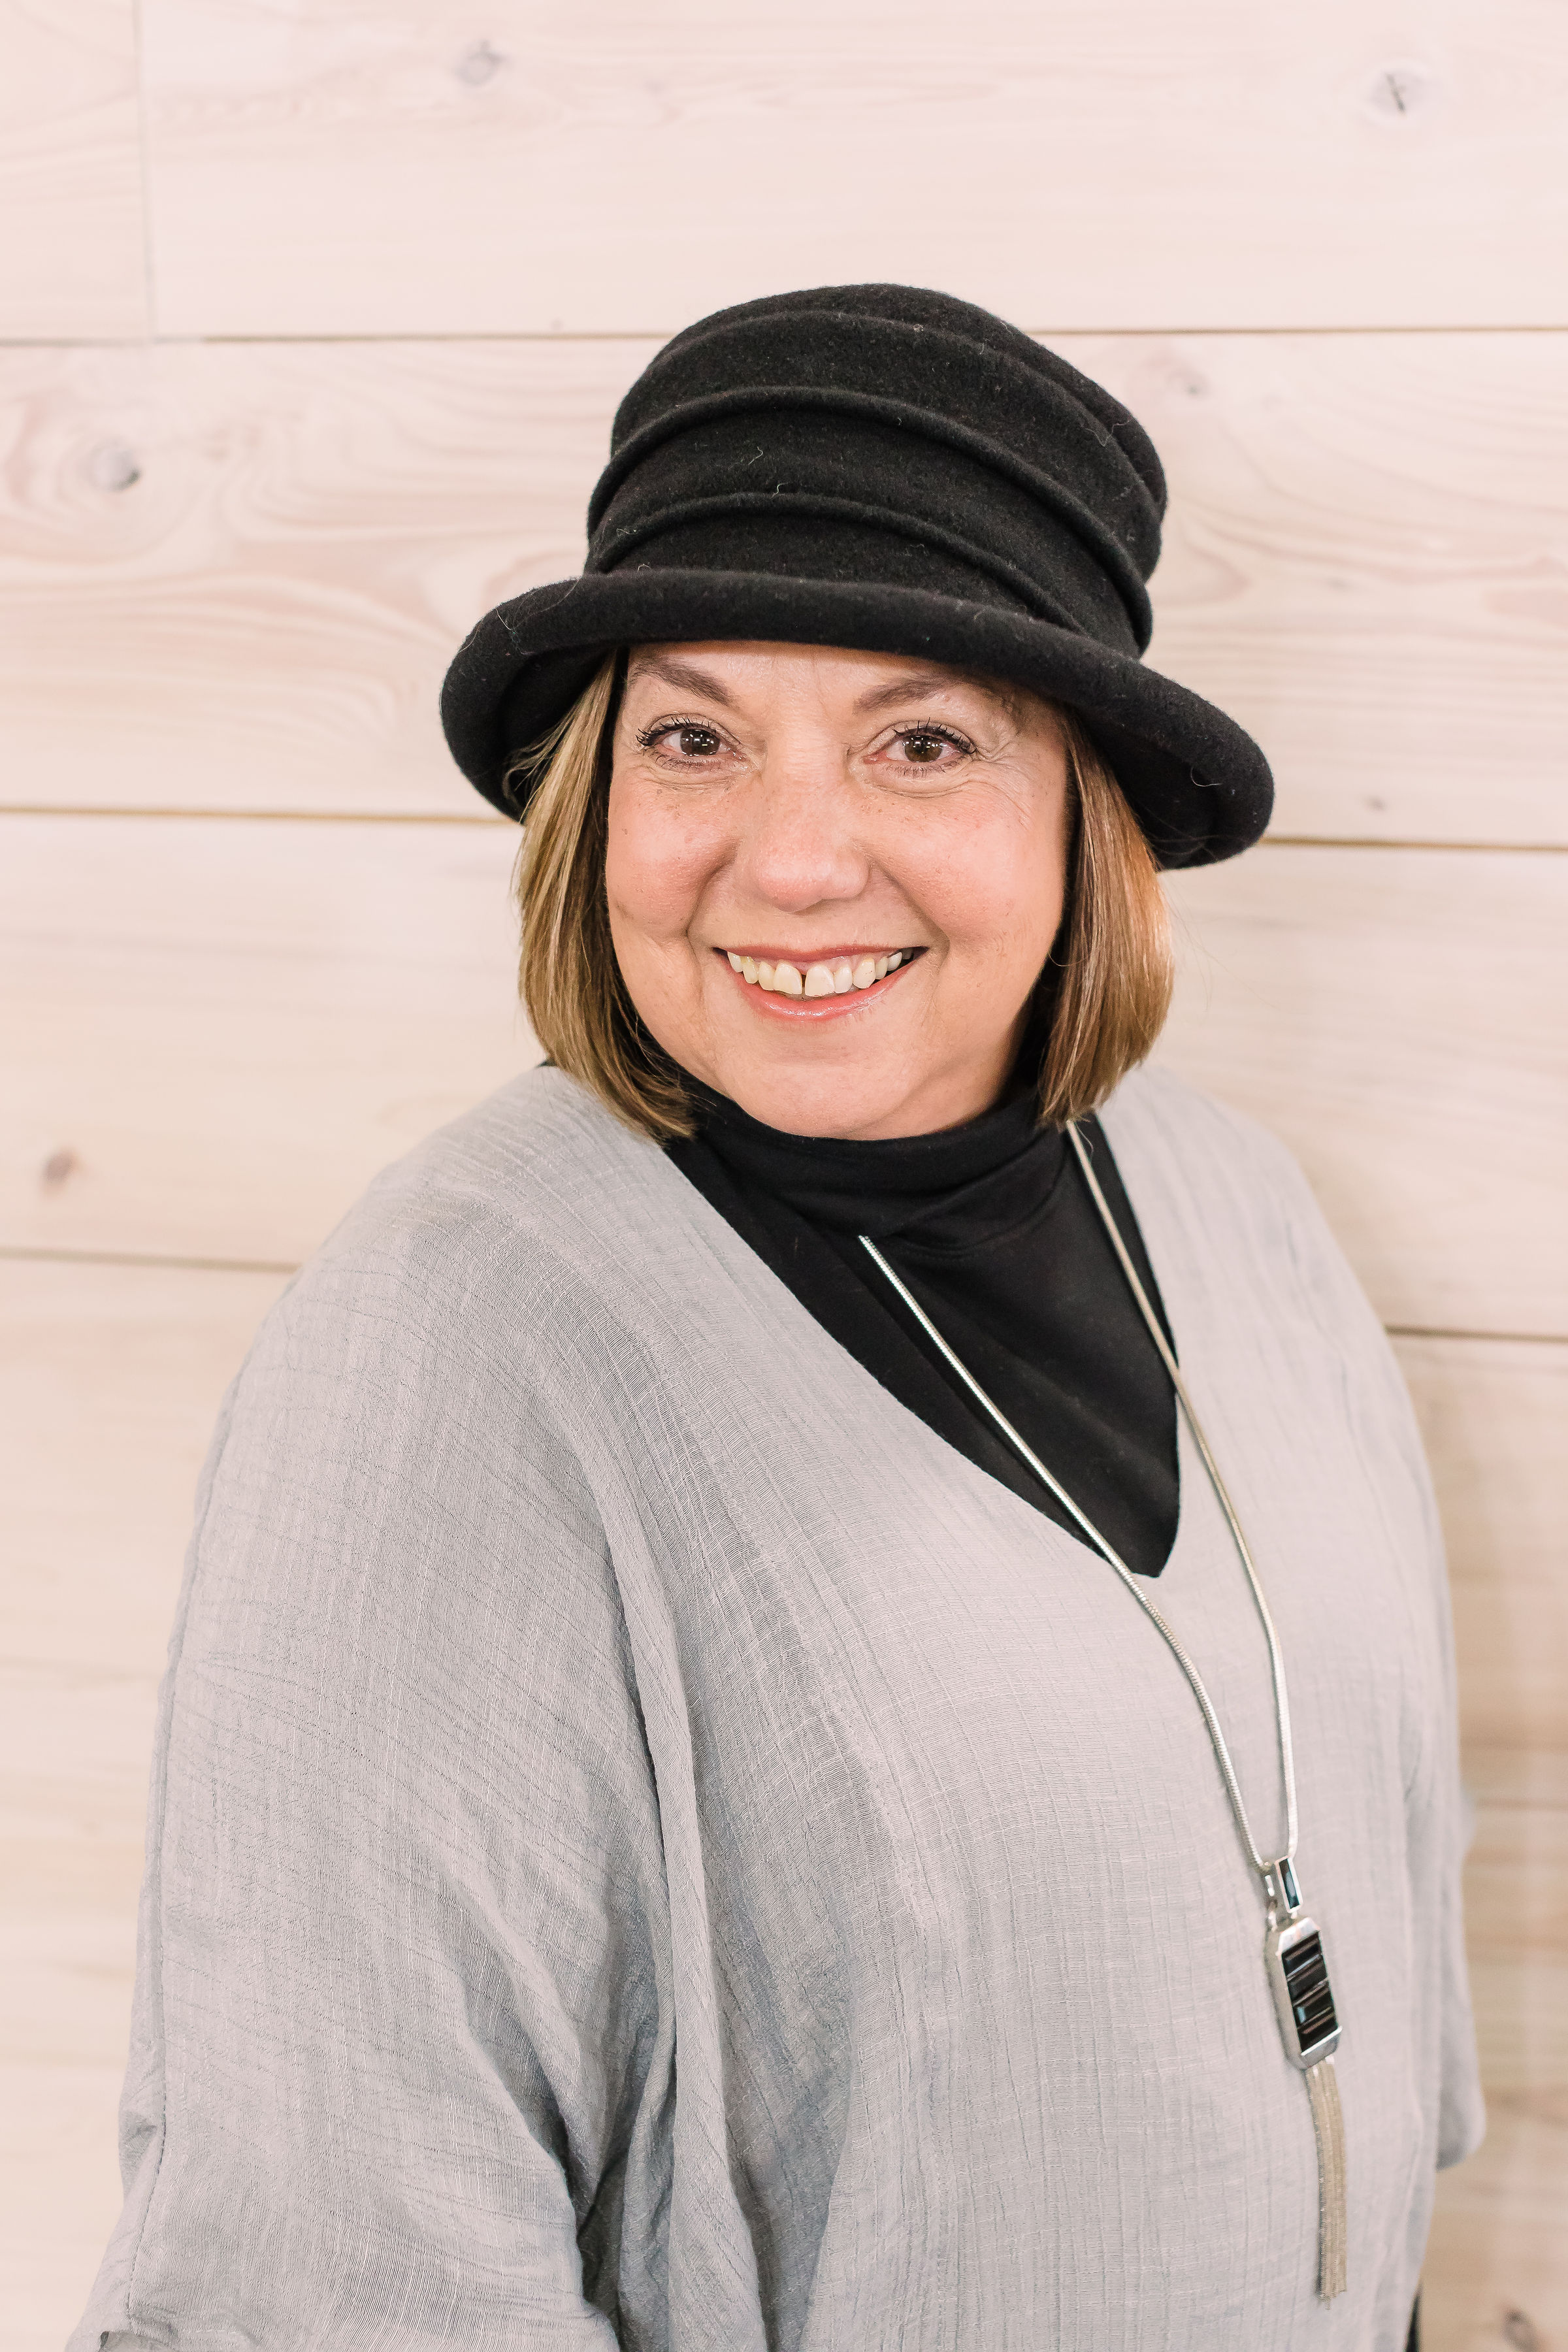 Celia Parham